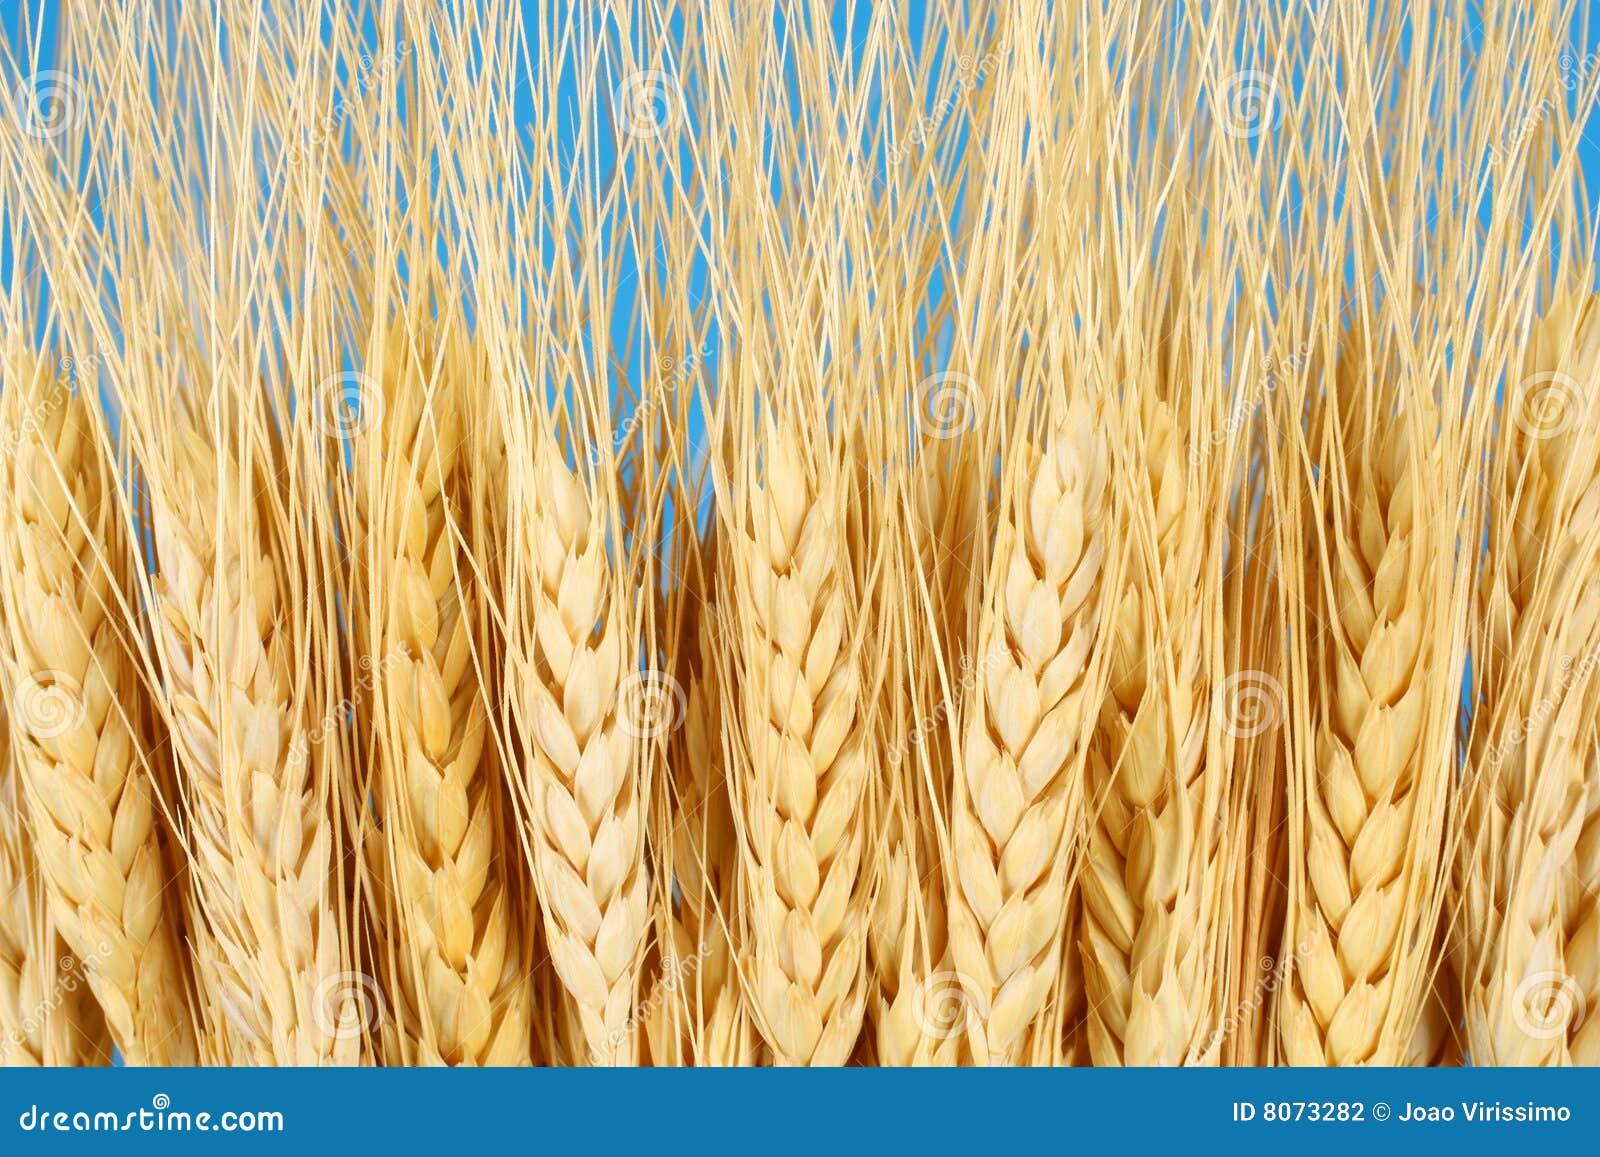 Wheat crop agriculture & farming concept